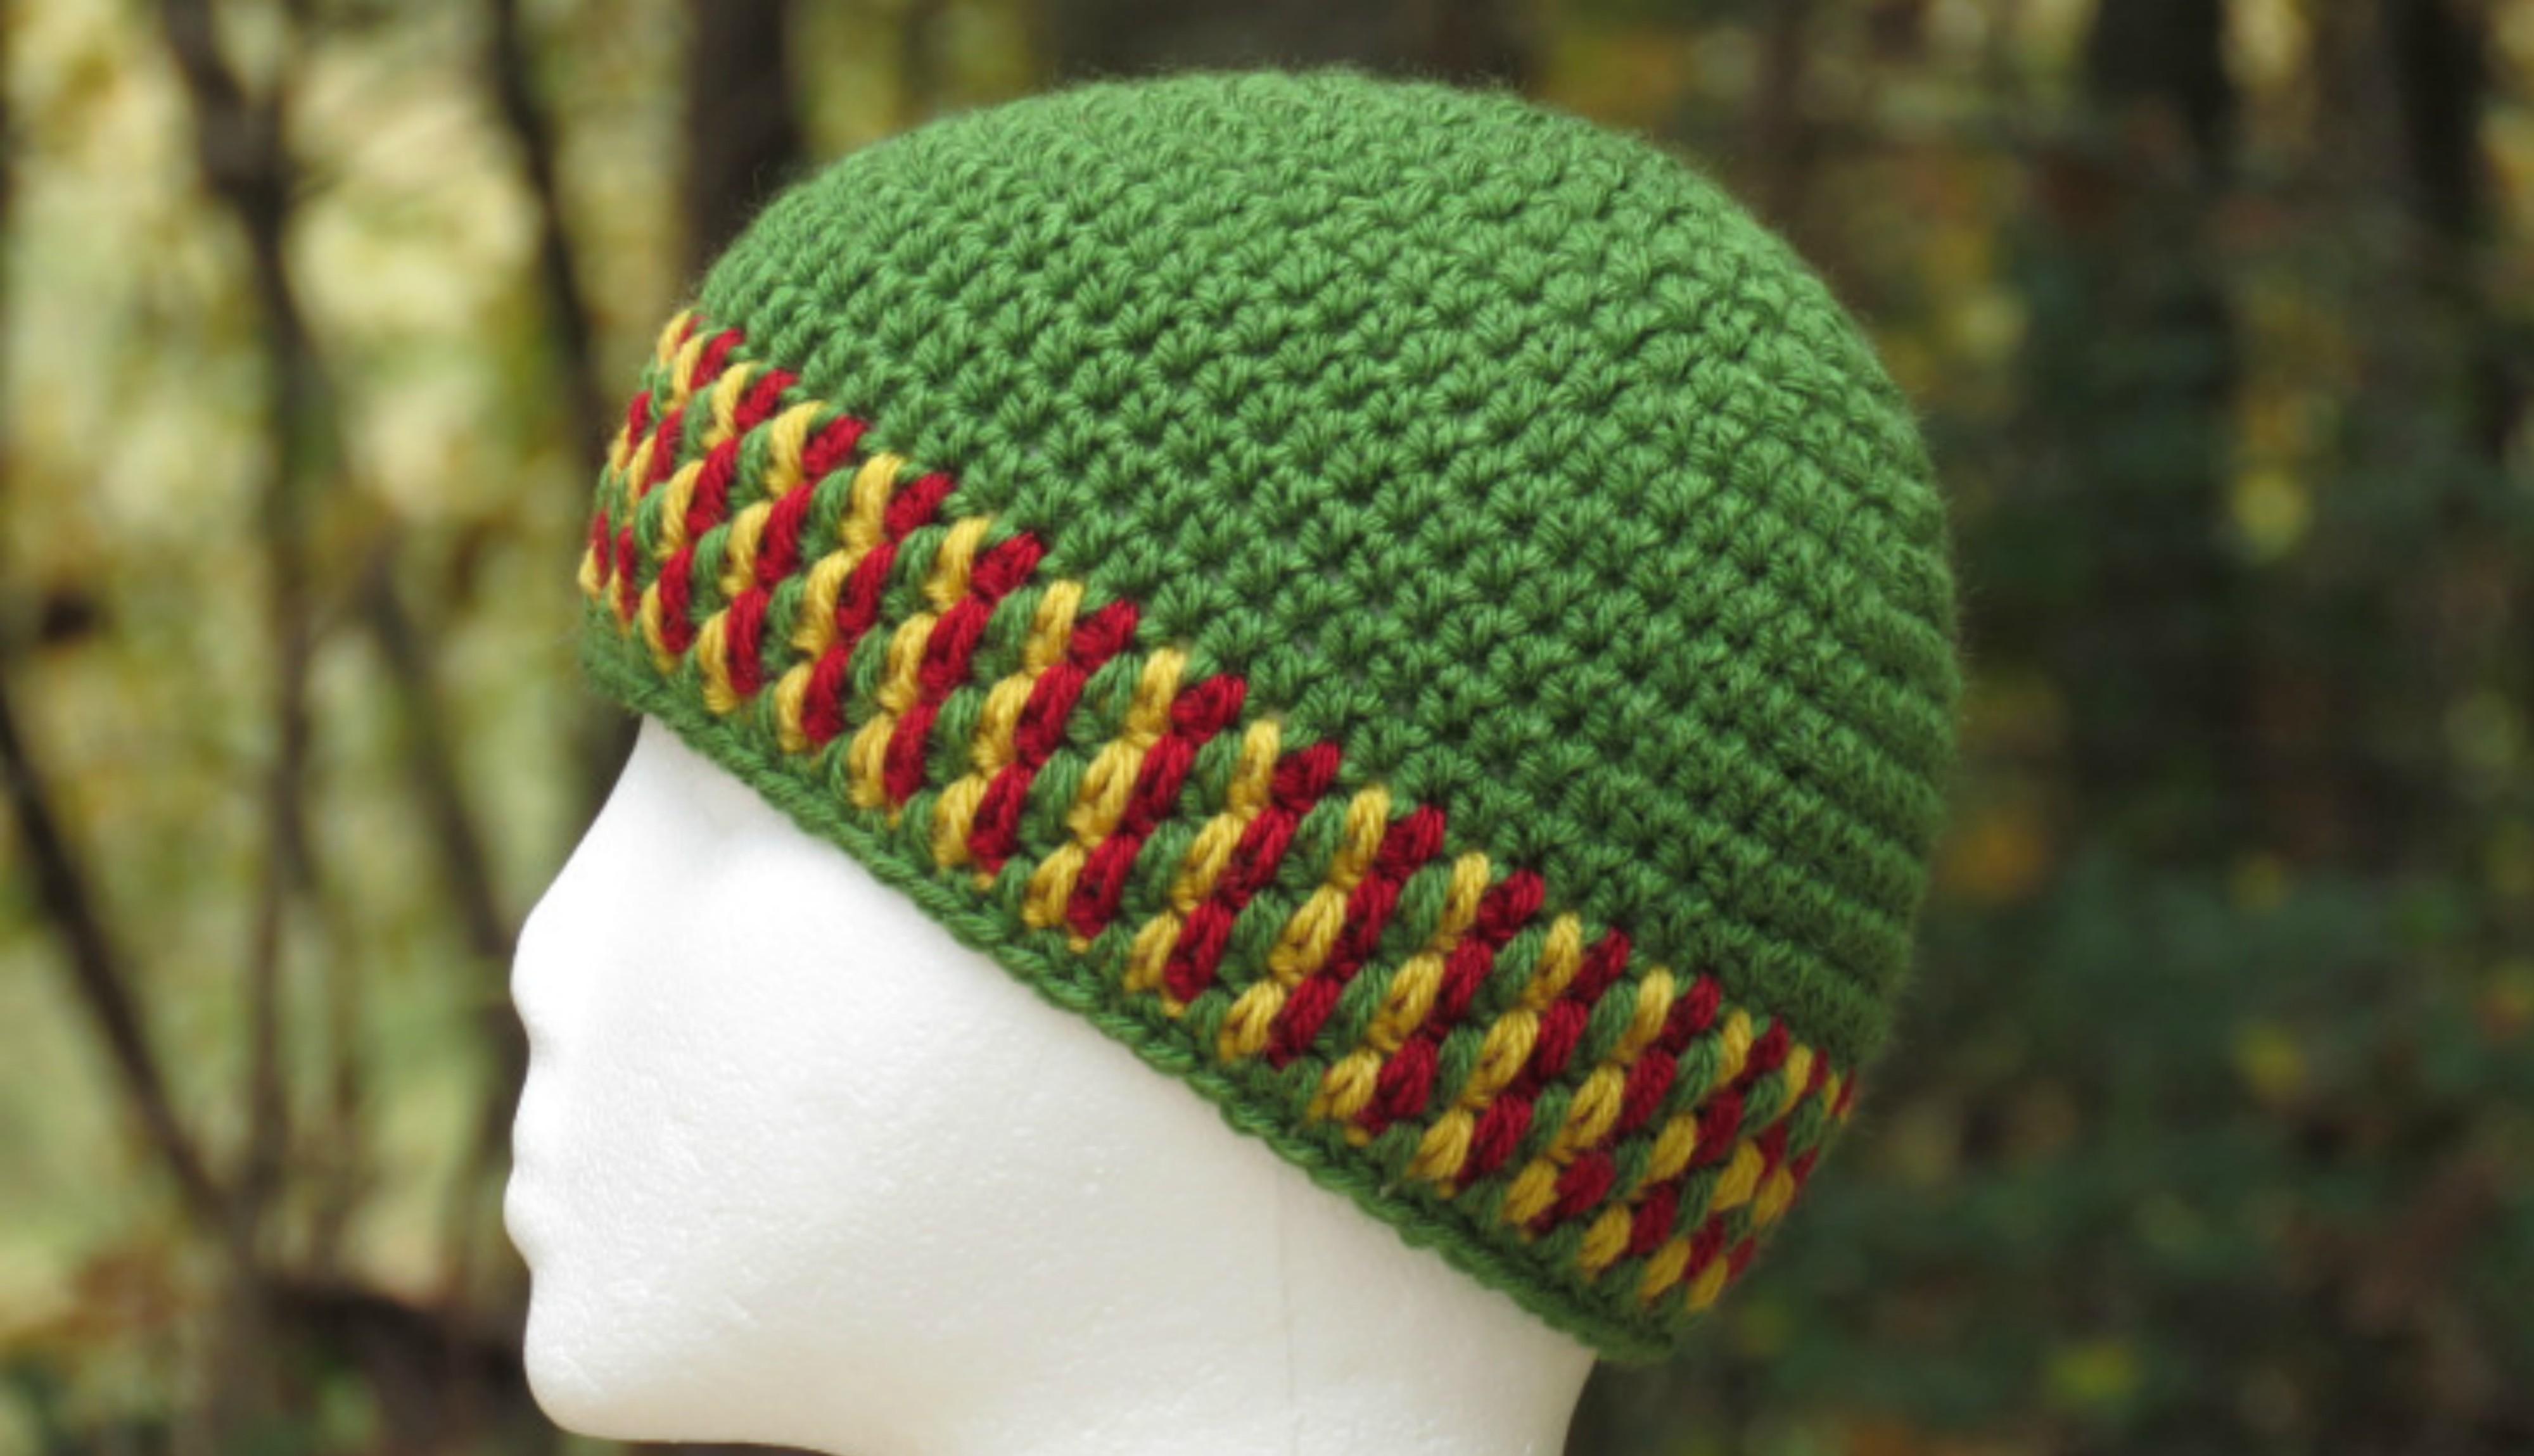 Crochet Spiked Mesh Stitch Hat